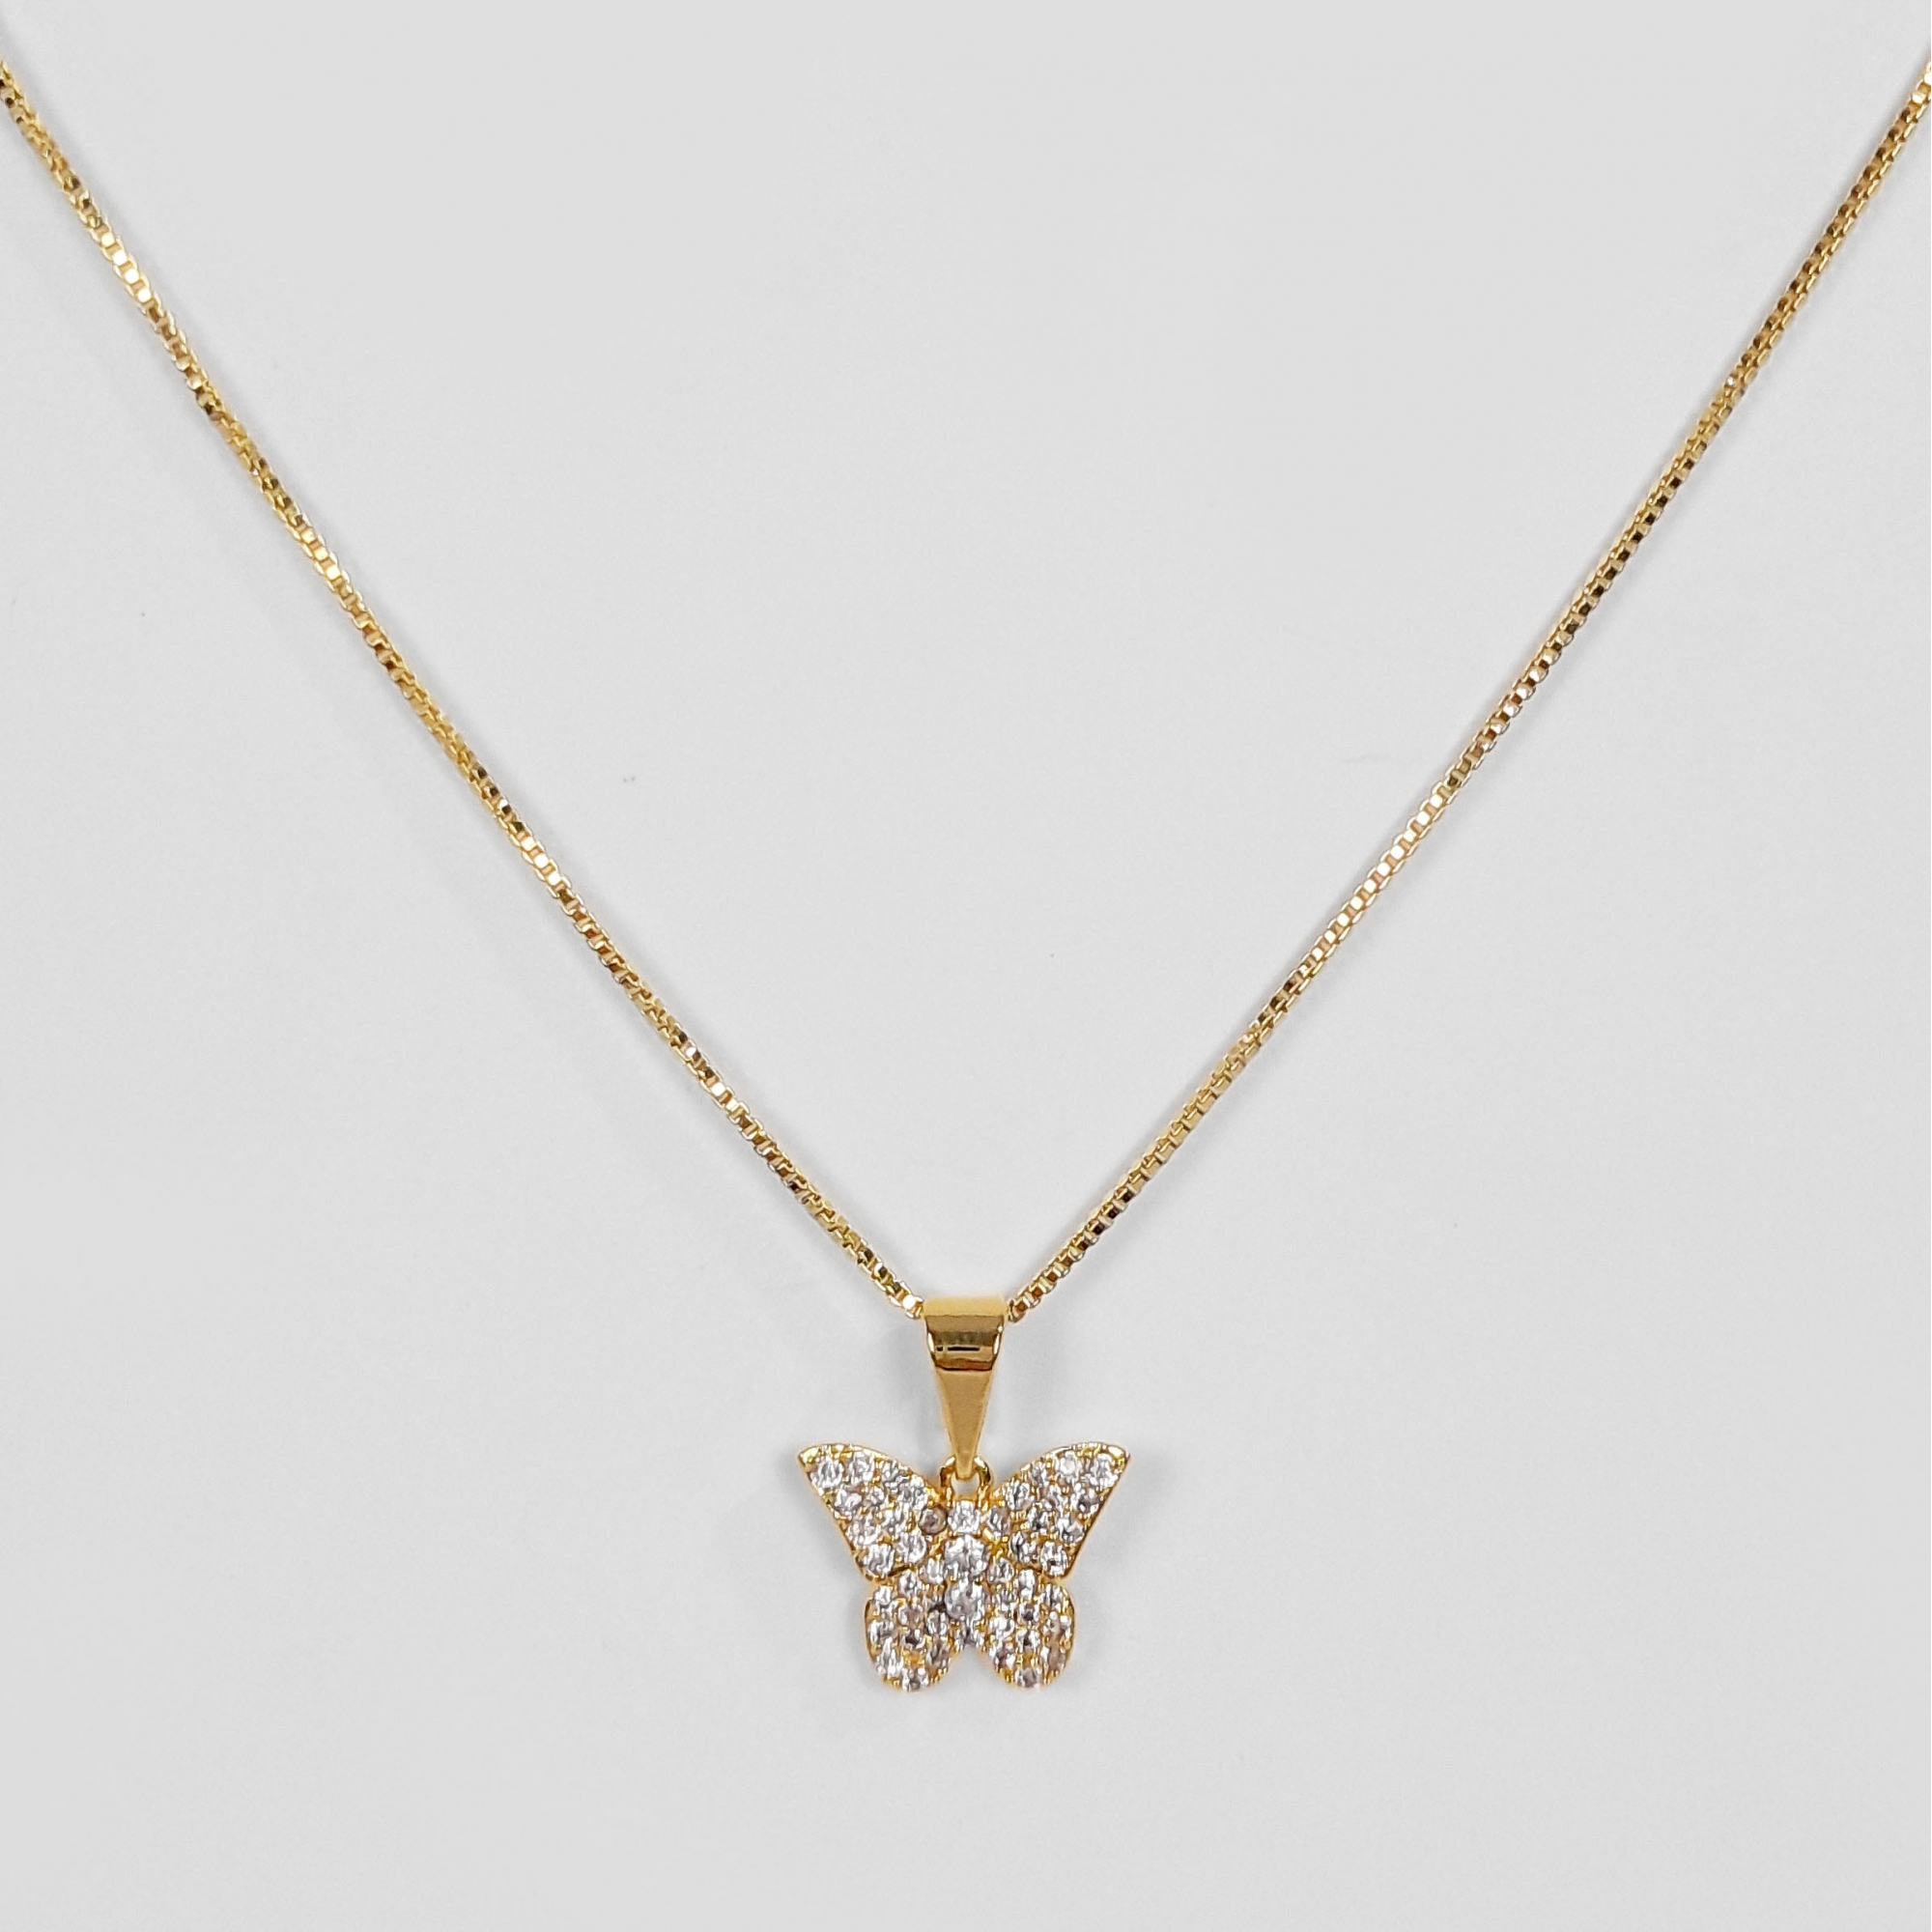 Gargantilha Borboleta Cravejada Zircônias Folheada Ouro 18k  - Lunozê Joias